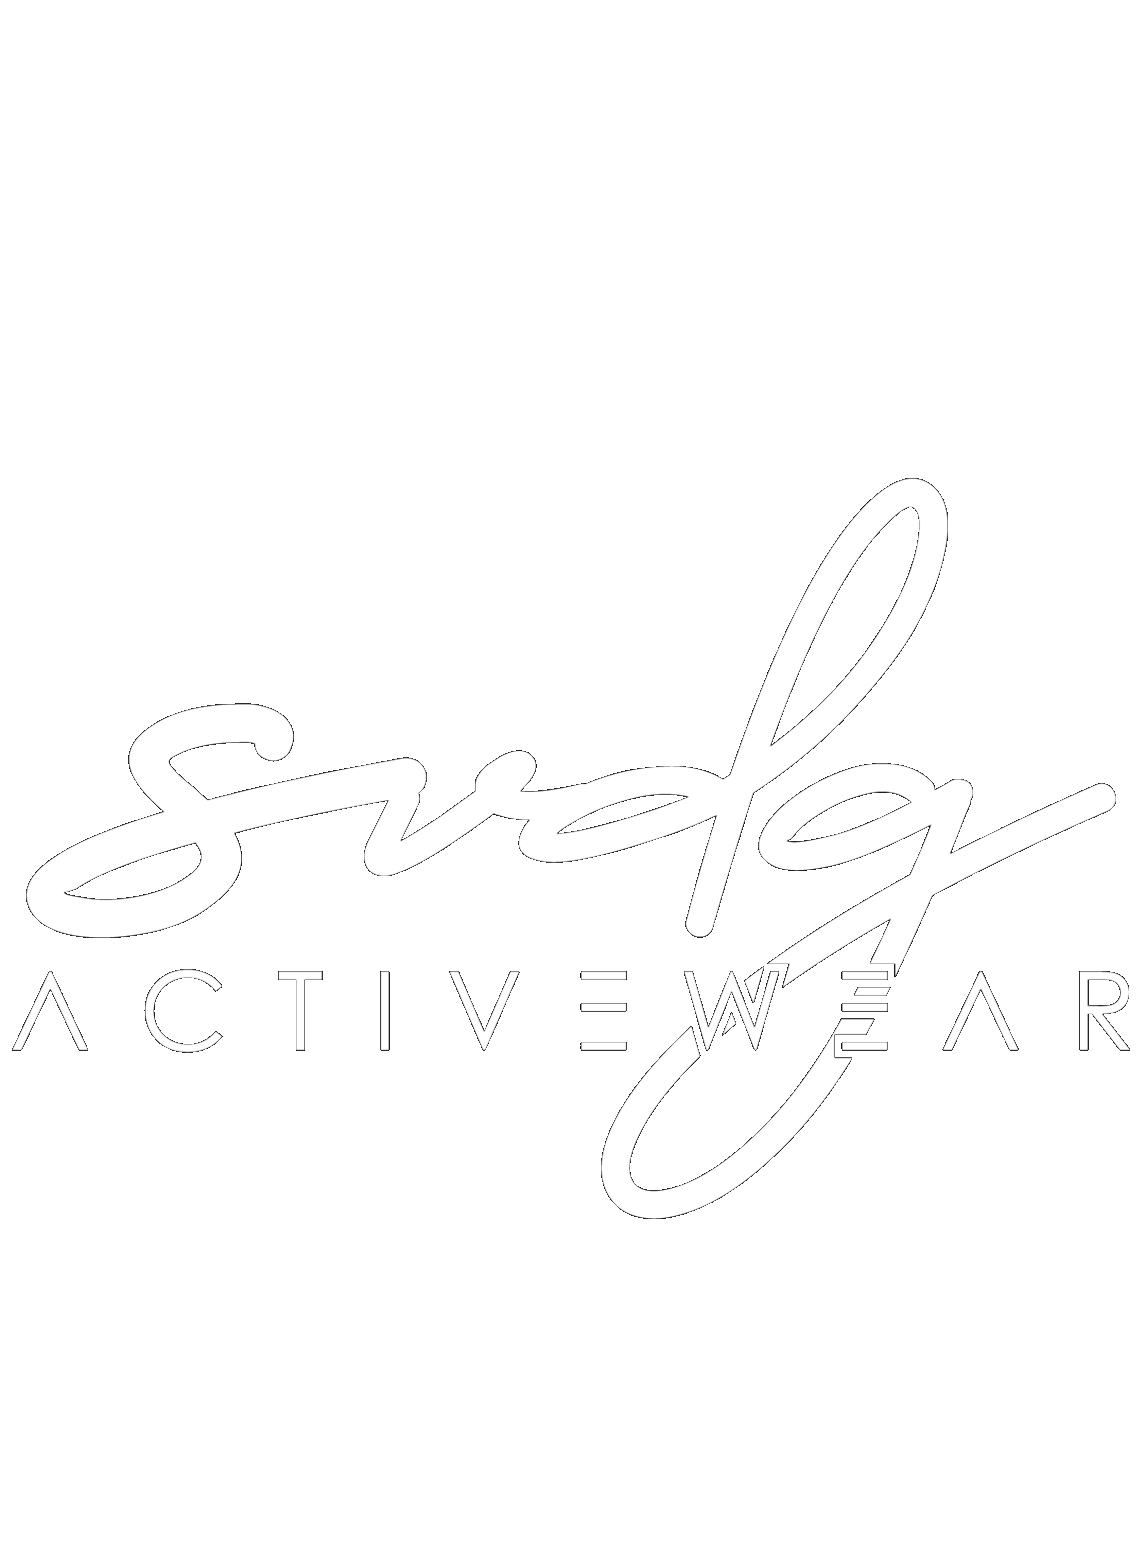 svdg-activewear-logo